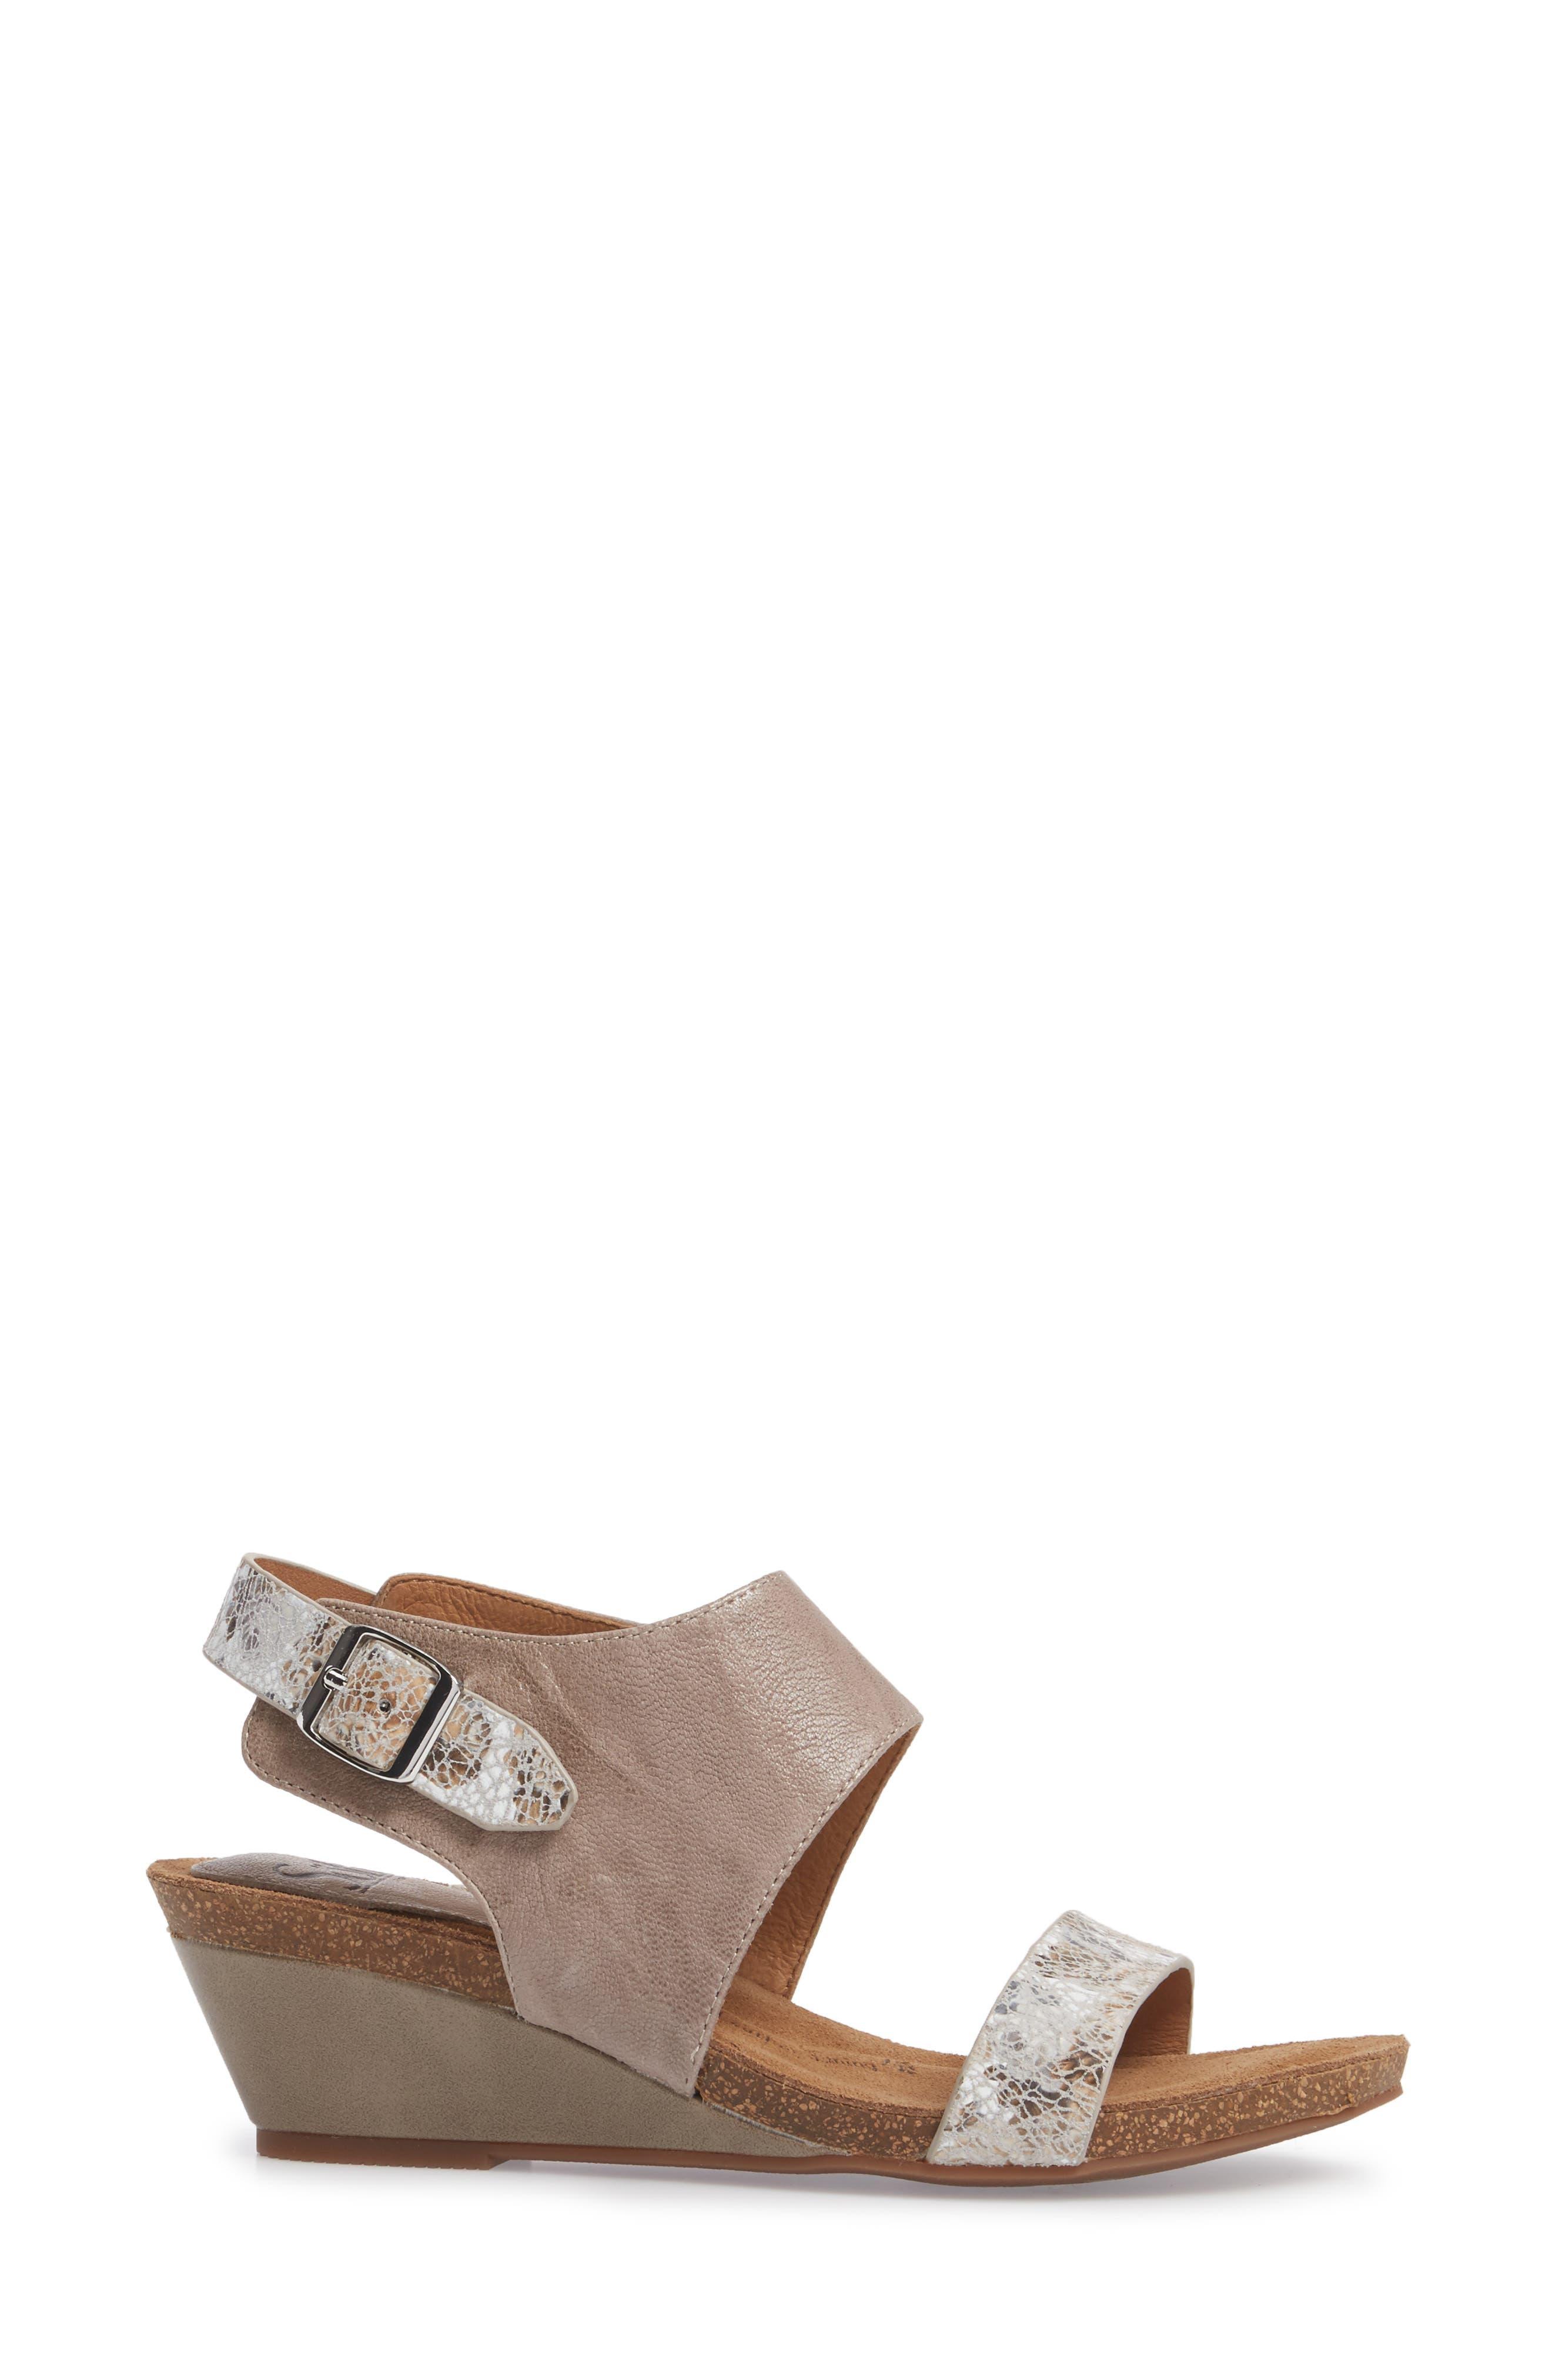 'Vanita' Leather Sandal,                             Alternate thumbnail 3, color,                             031